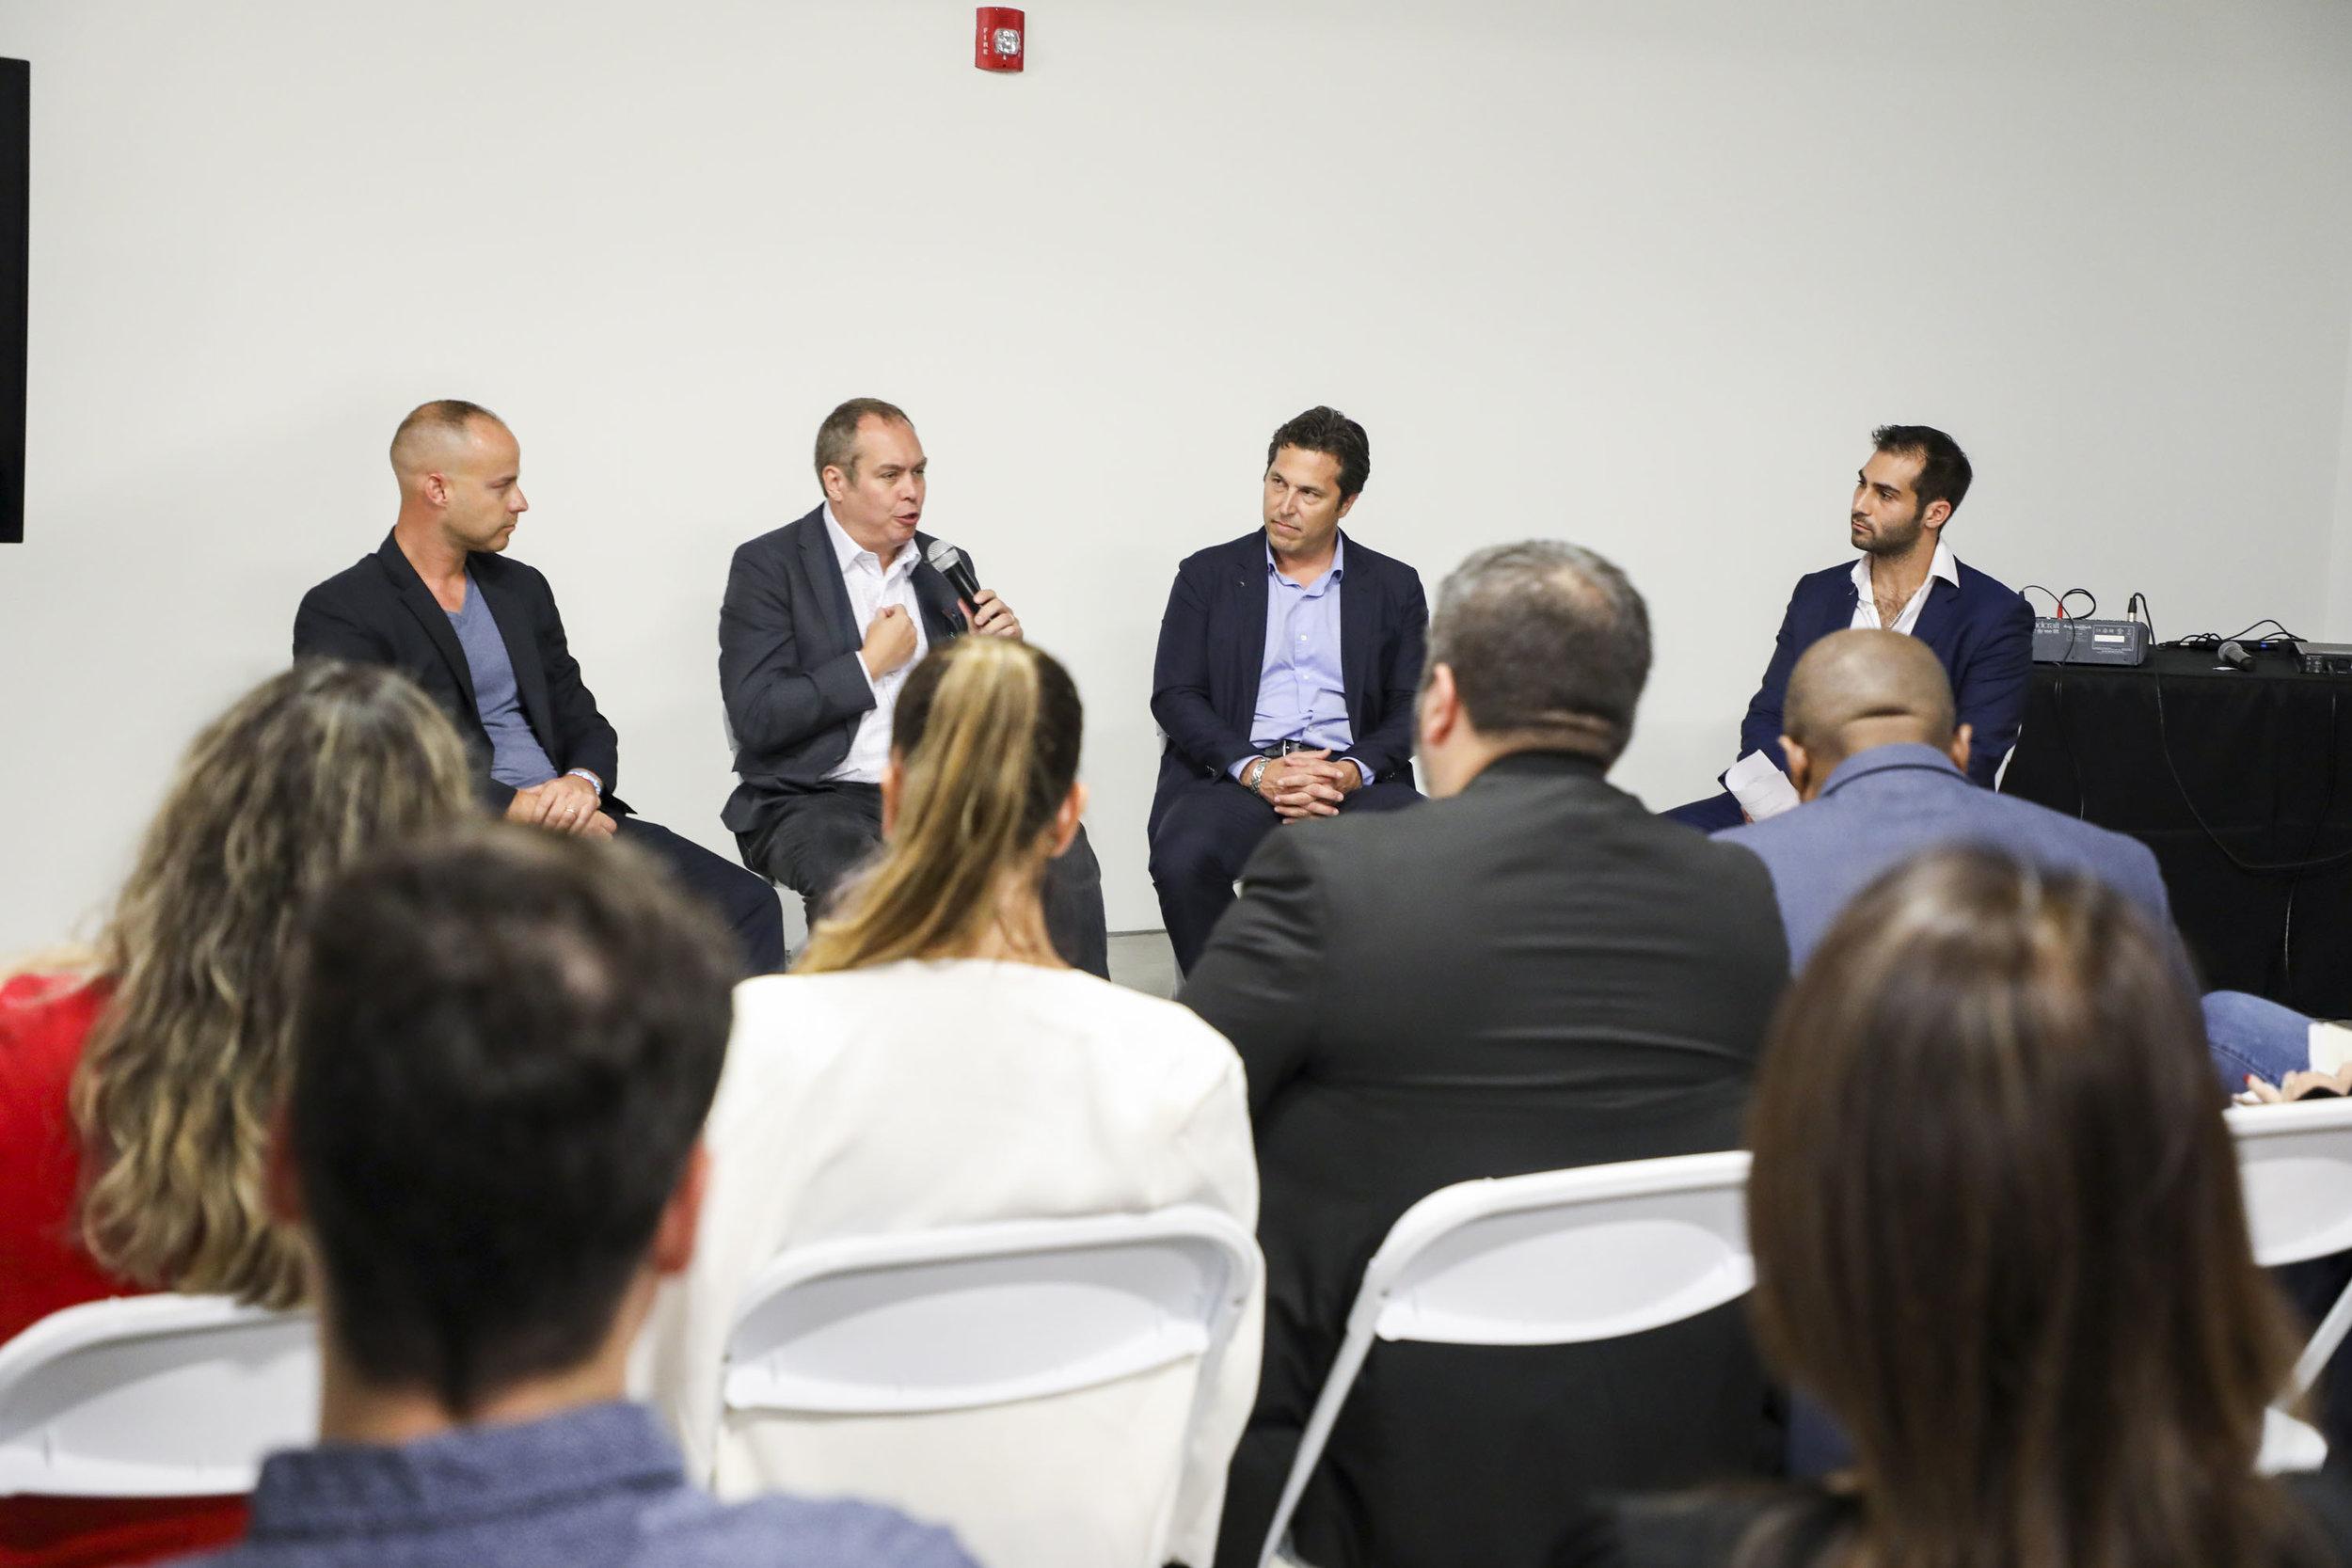 Jeremy Waks, John Cardello, Martin Pinilla, & Demetri Demascus Inside The PROFILEmiami Fall Real Estate Showcase & Forum 2018